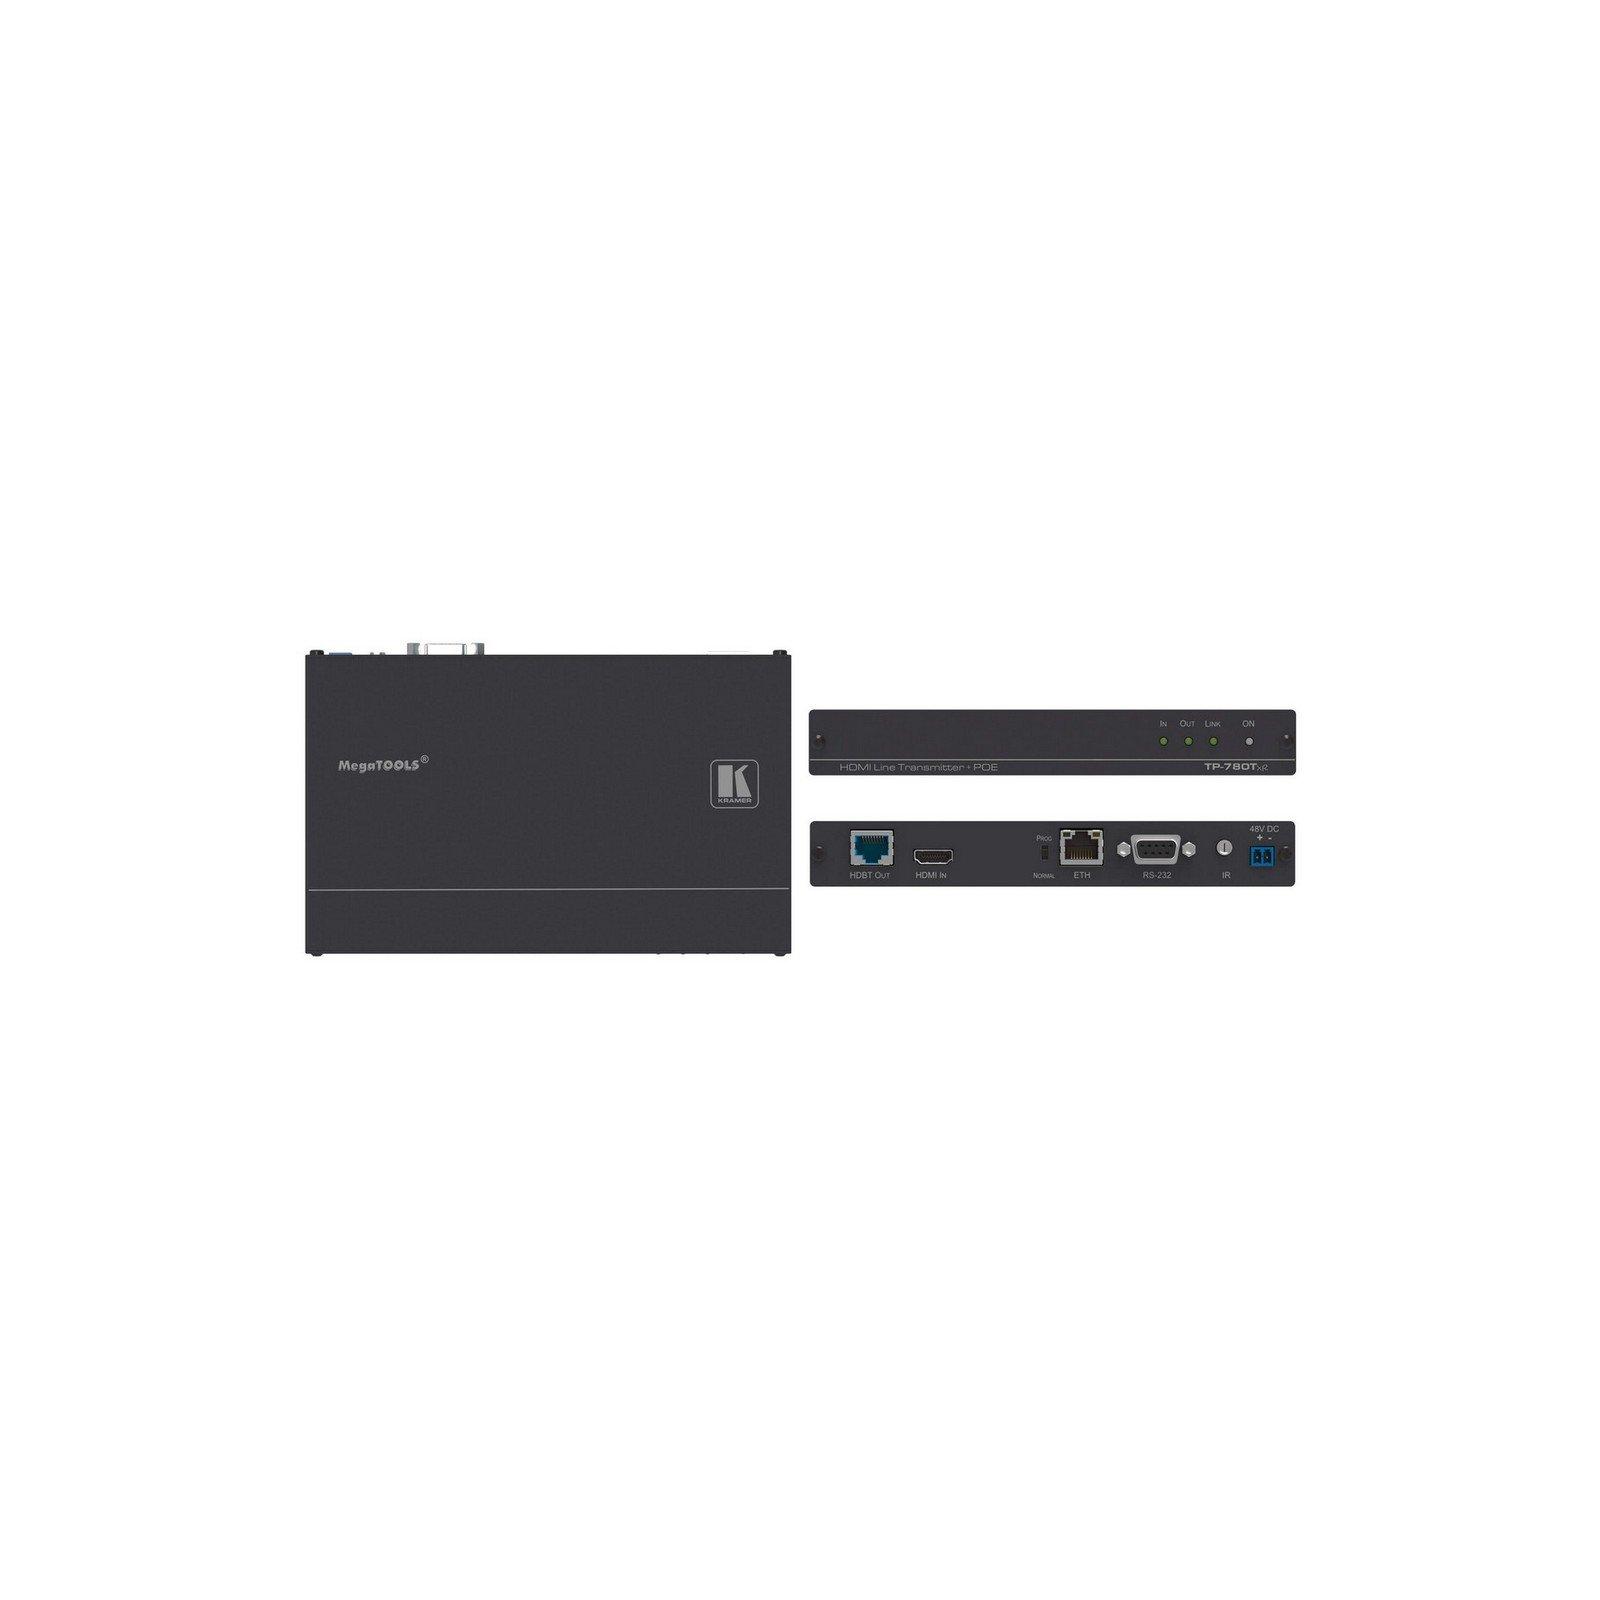 Kramer TP-780TXR   4K60 HDMI HDCP PoE HDBaseT Transmitter with Ethernet